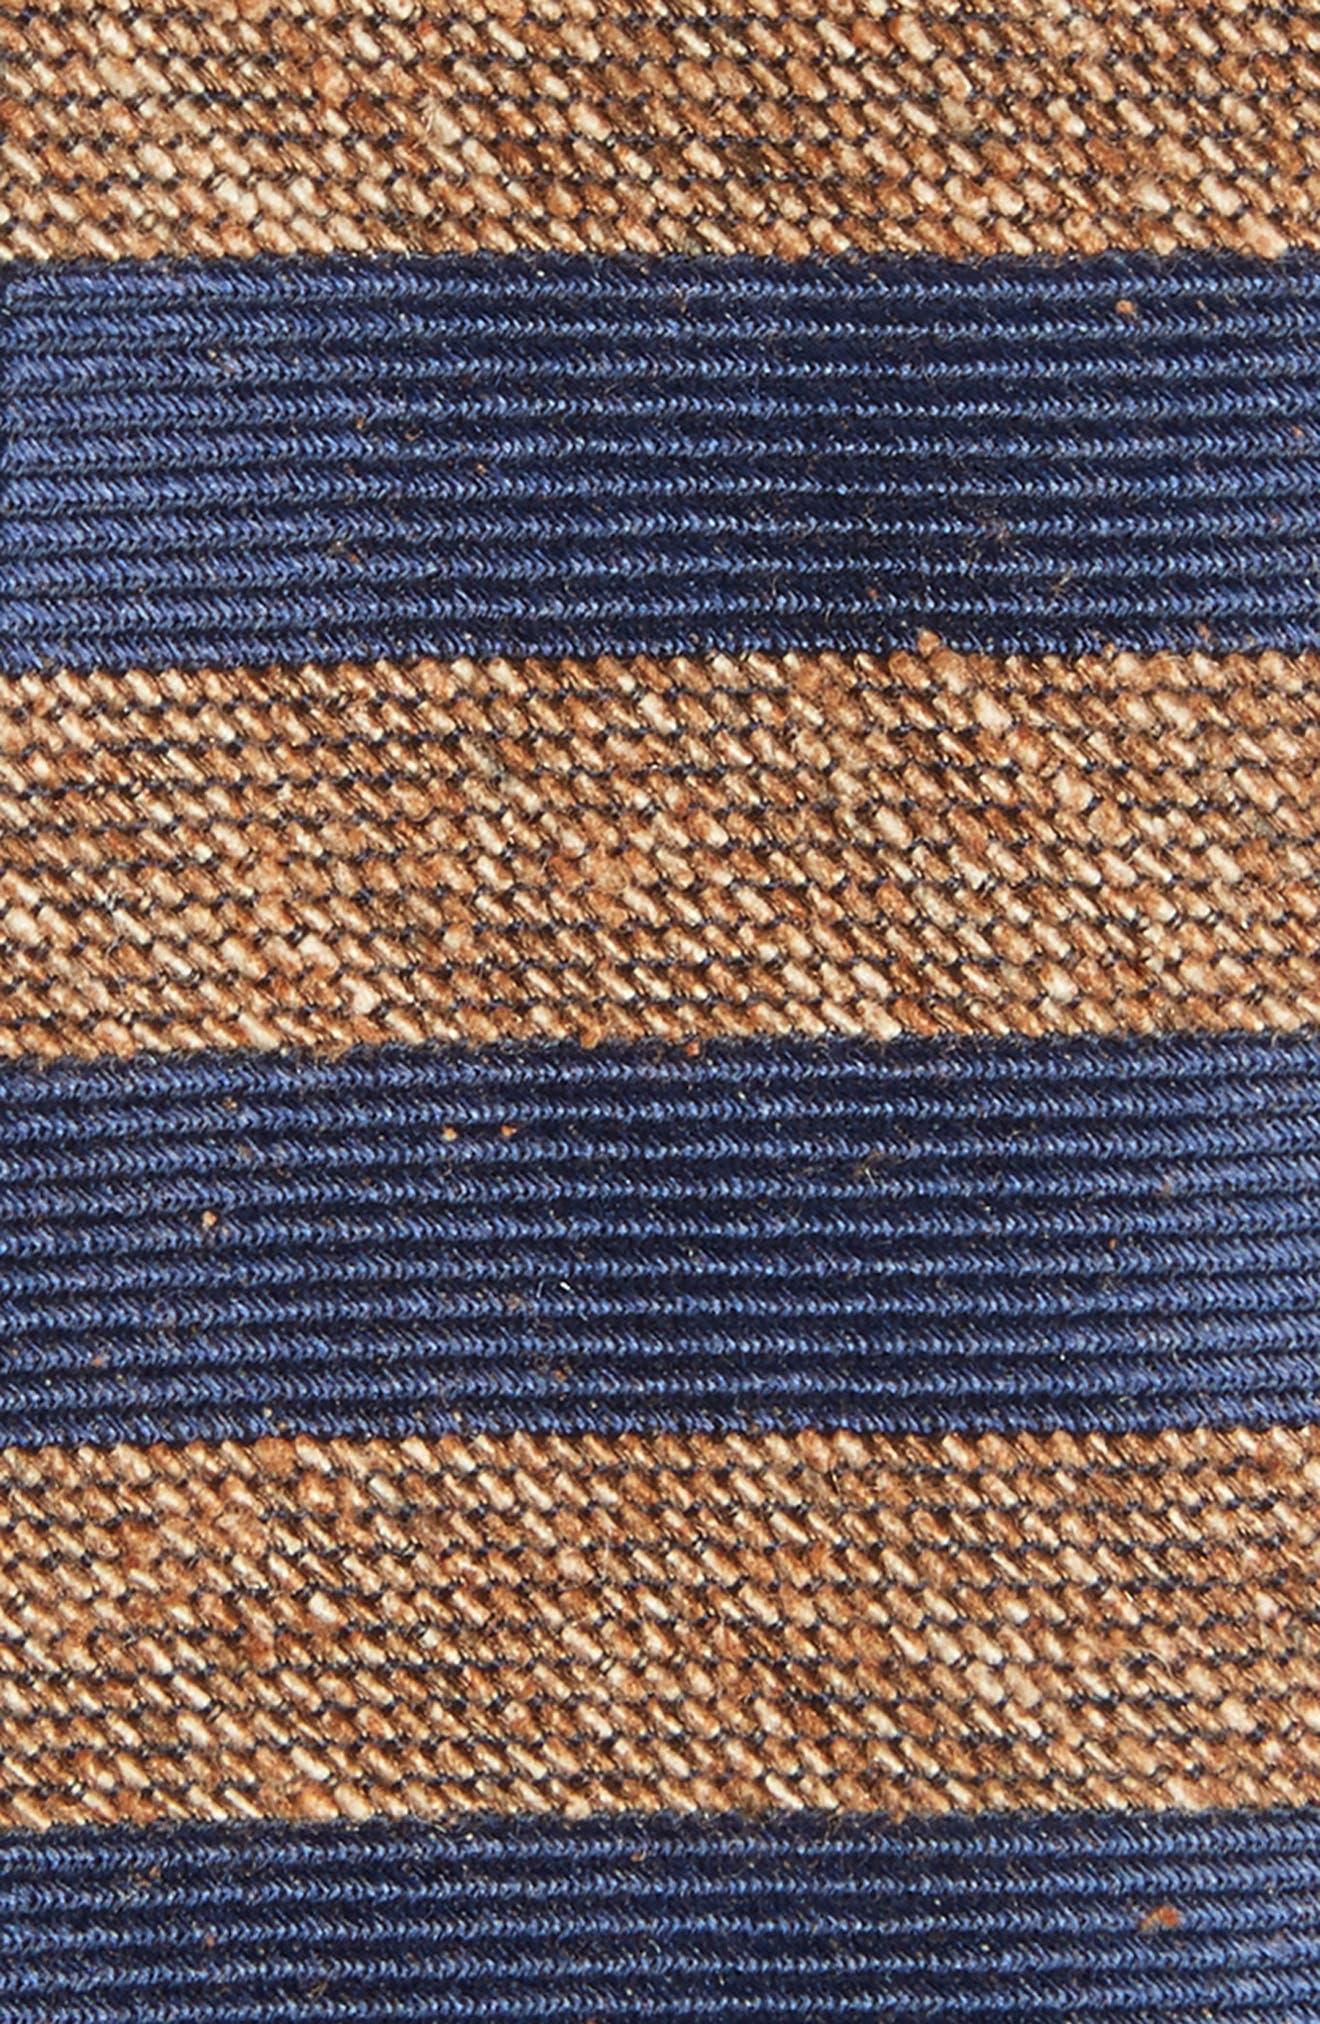 Meter Stripe Nep Silk Tie,                             Alternate thumbnail 2, color,                             200